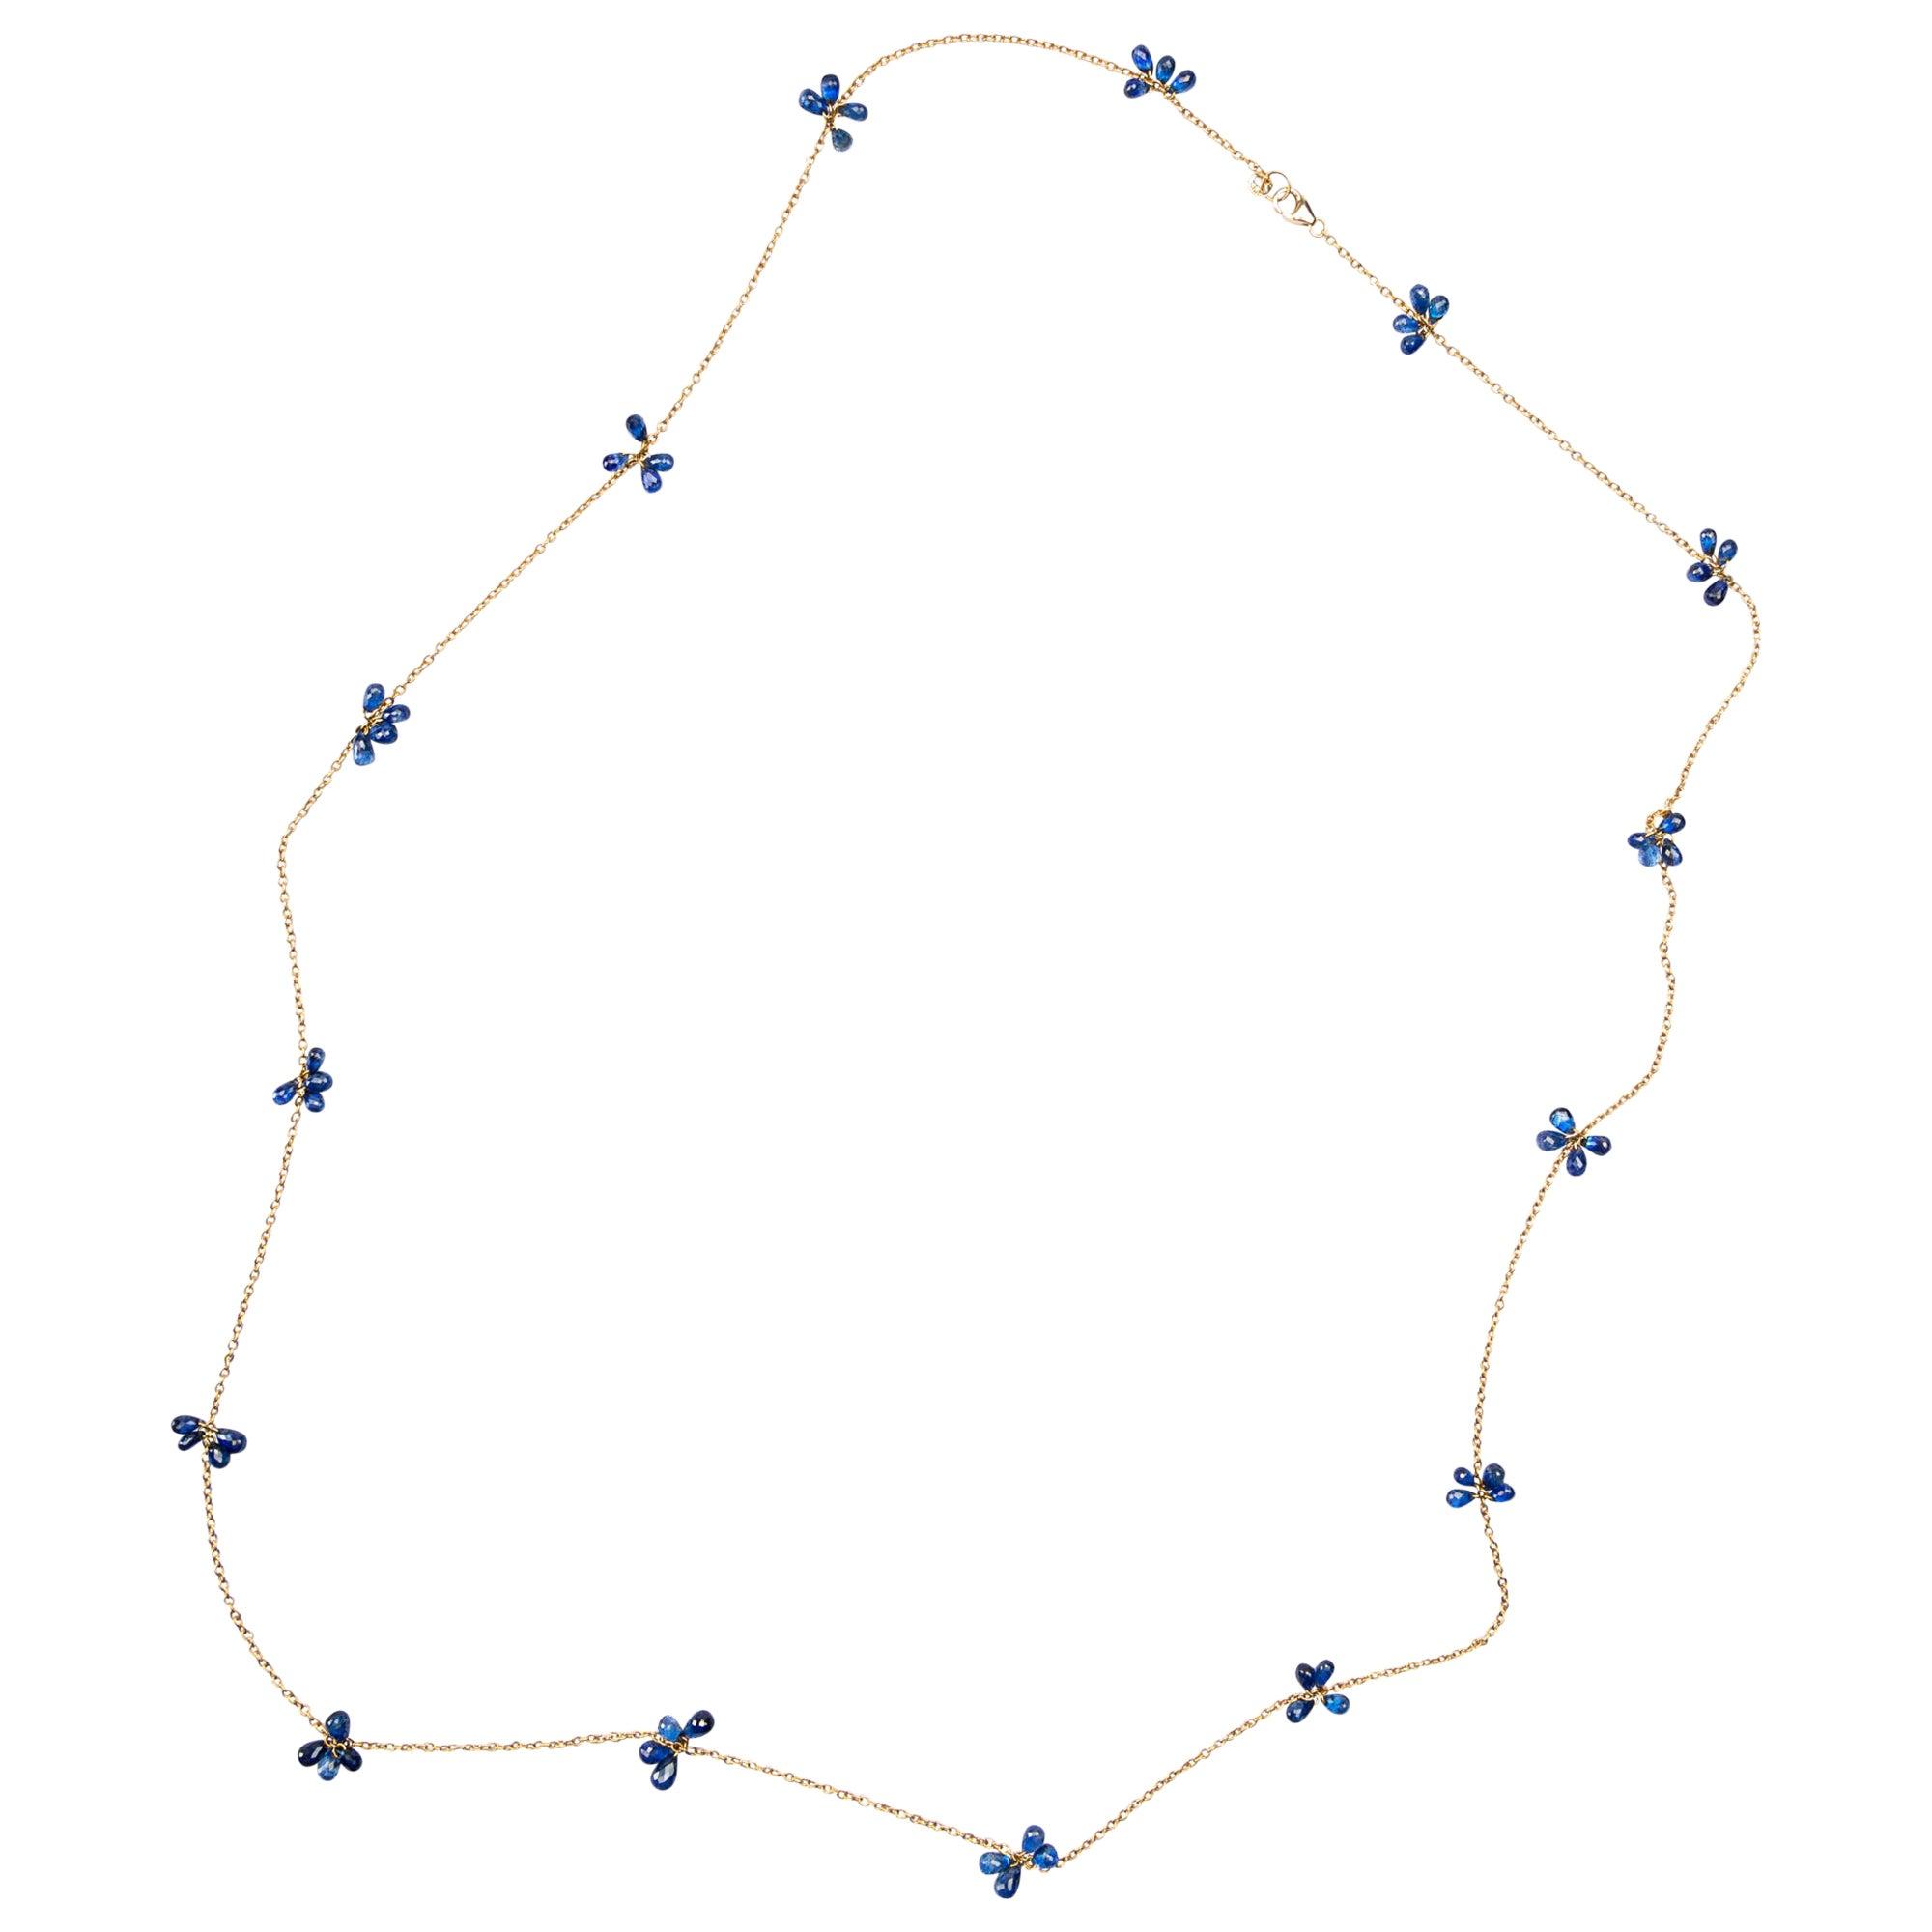 Jona Blue Sapphire 18 Karat Yellow Gold Long Chain Necklace